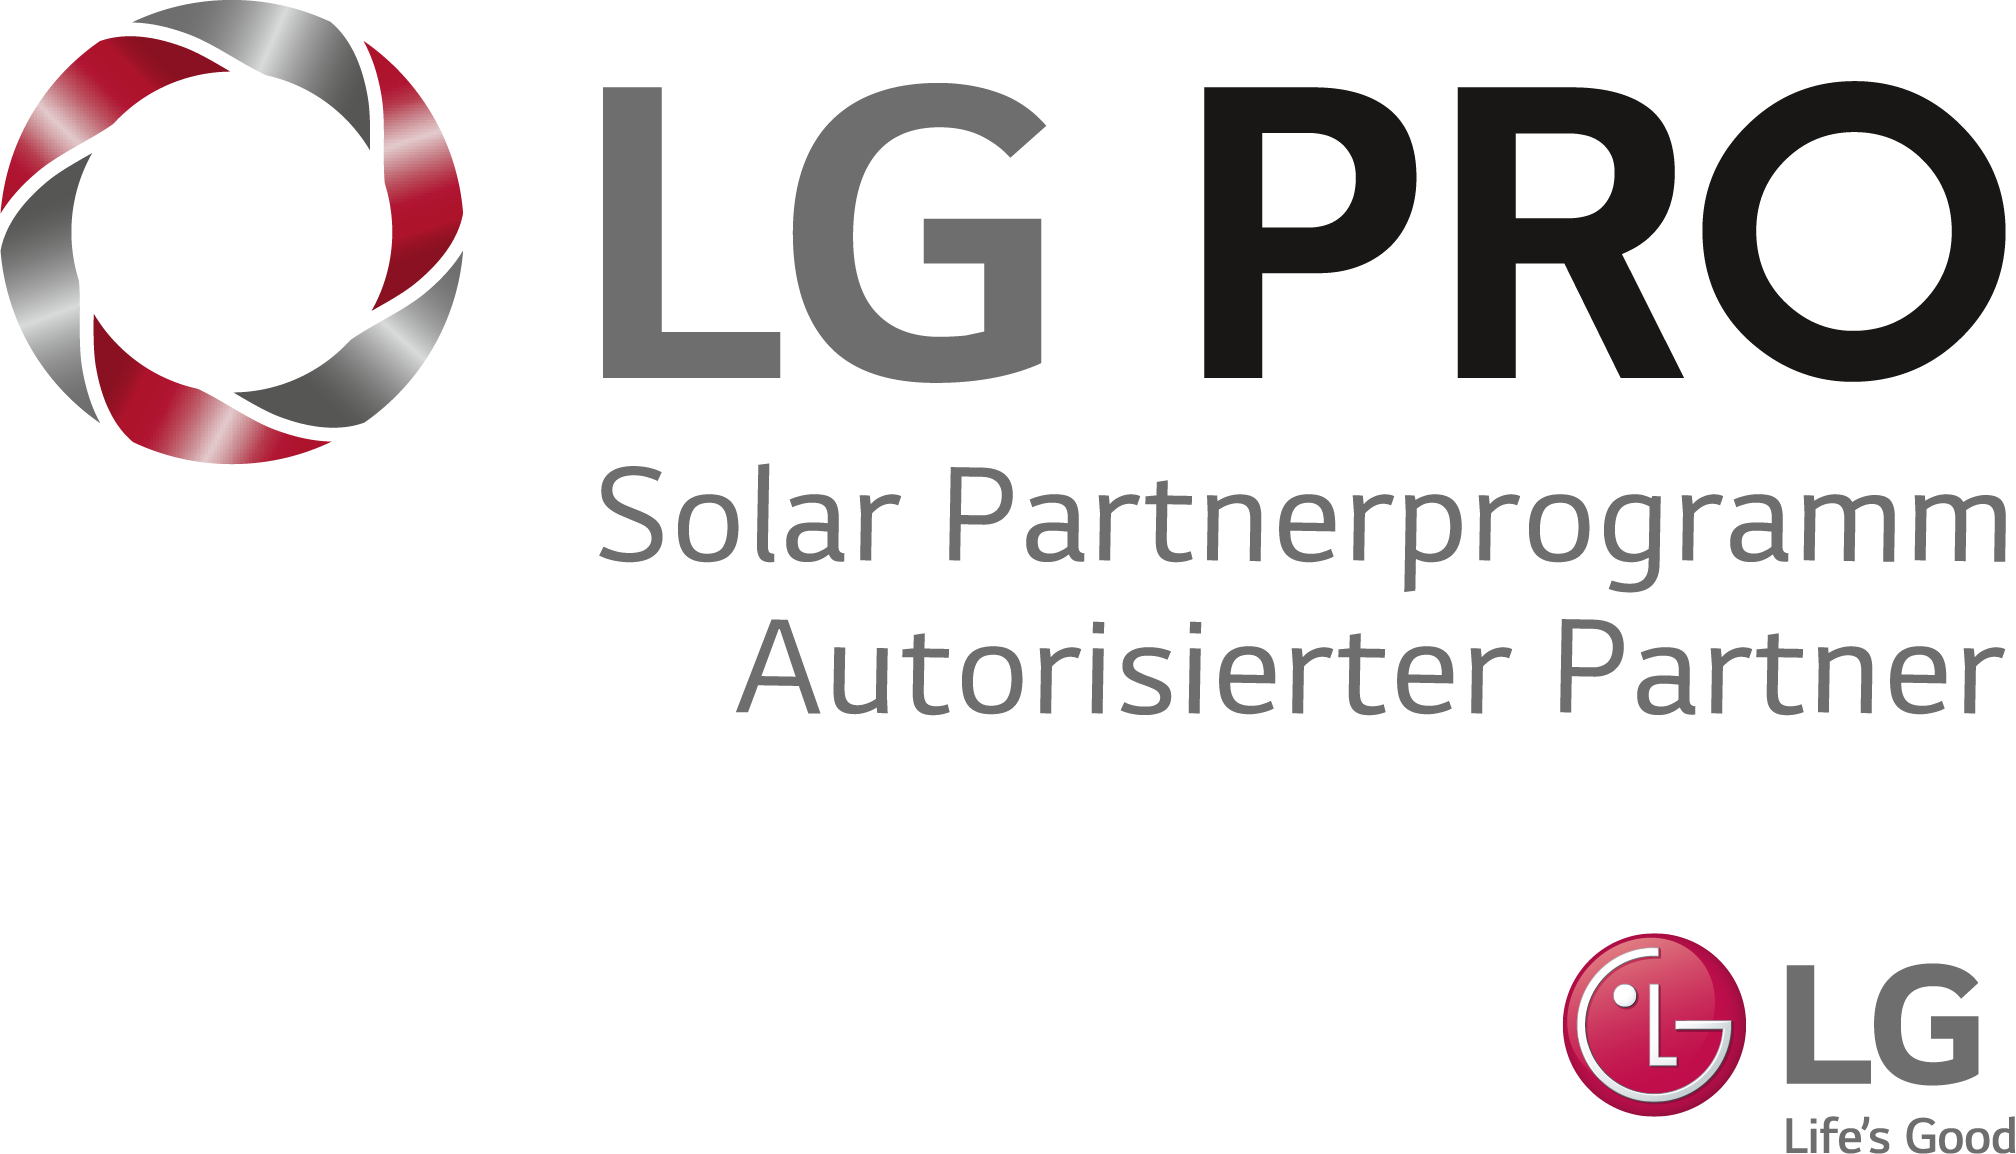 LG PRO - Solar Parterprogramm Autorisieter Partner